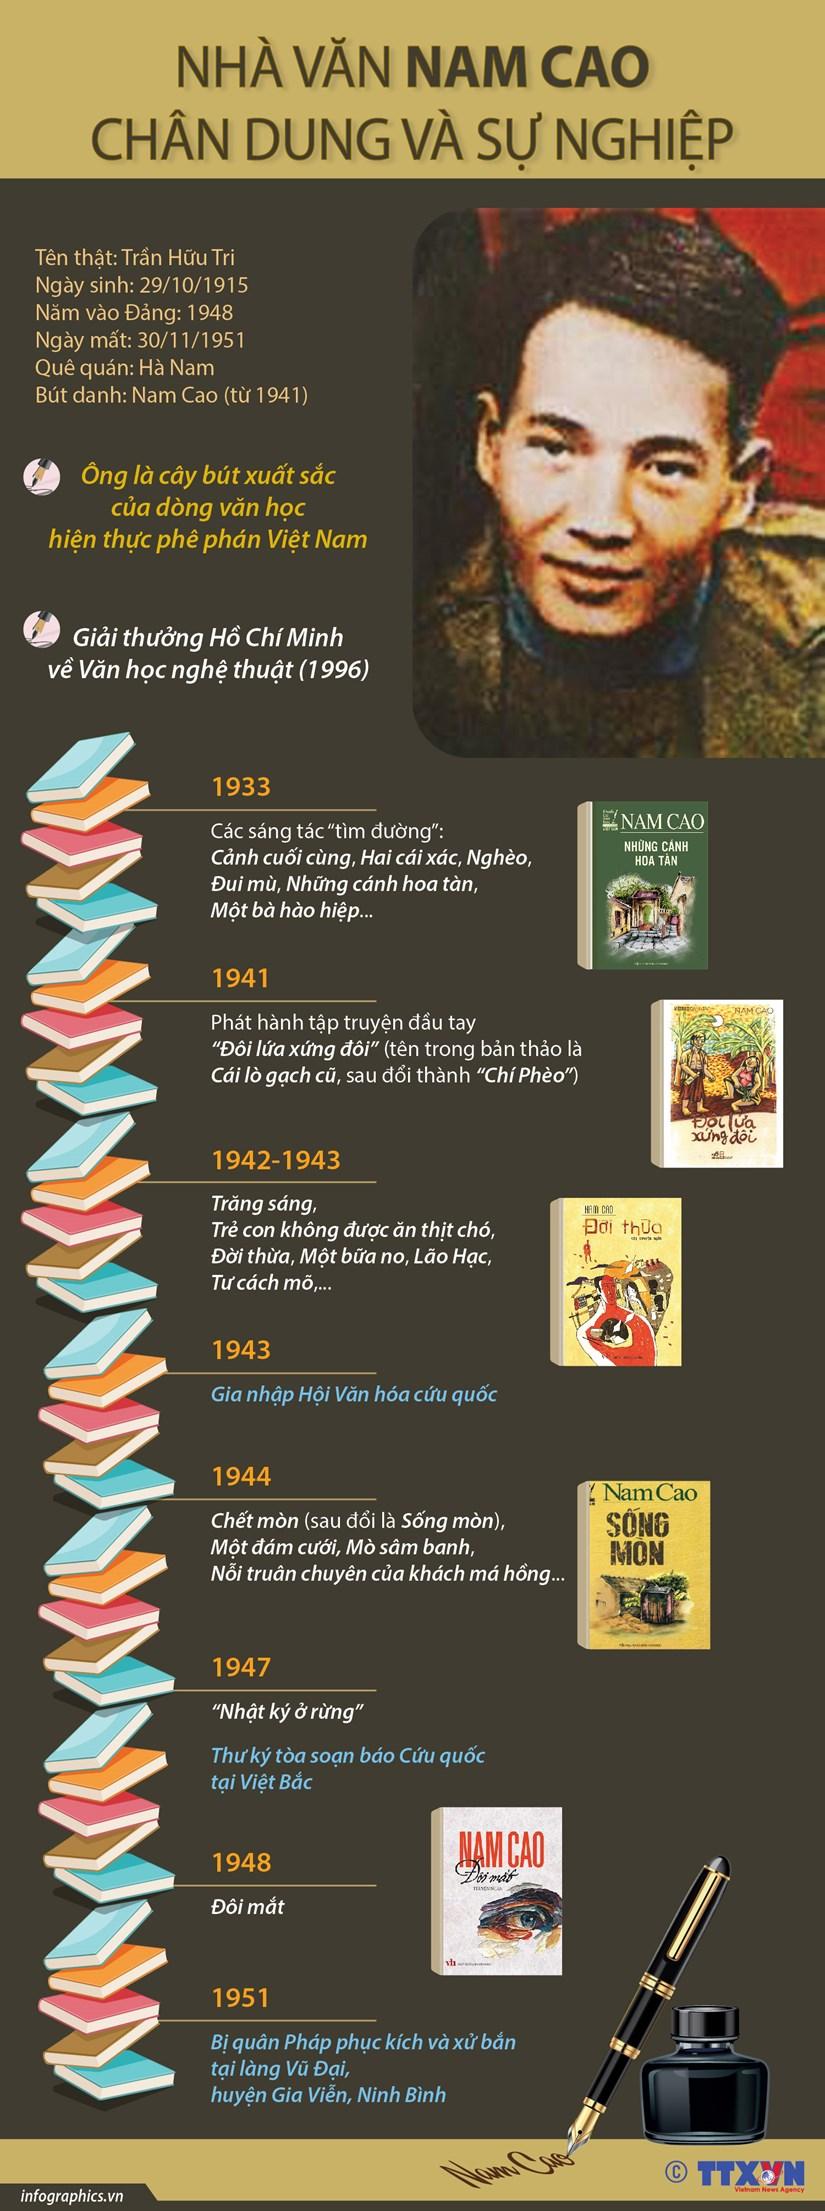 [Infographics] Chan dung va su nghiep cua nha van Nam Cao hinh anh 1